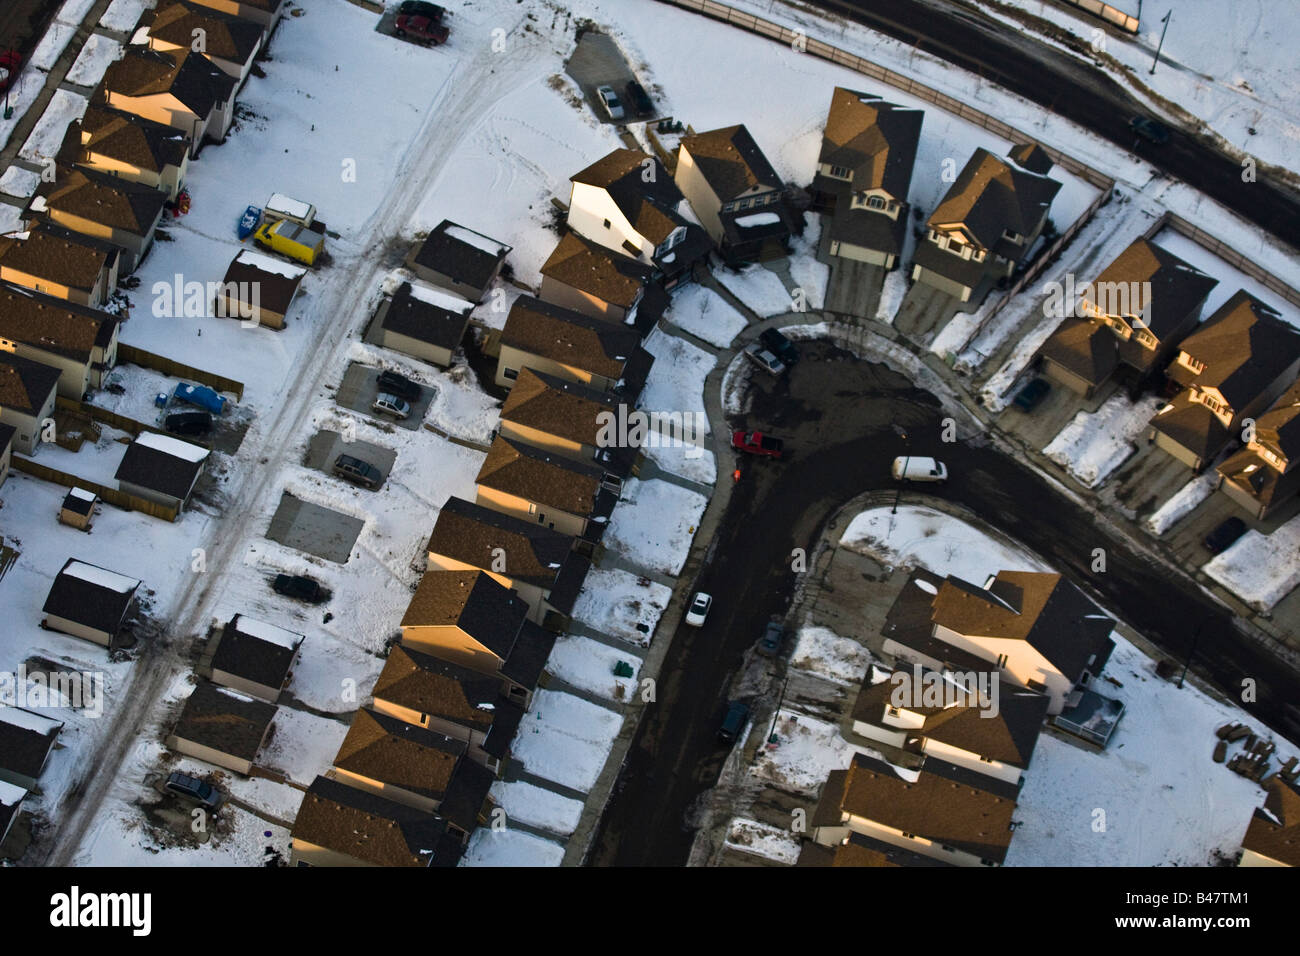 Aerial view of neighborhood in winter - Stock Image